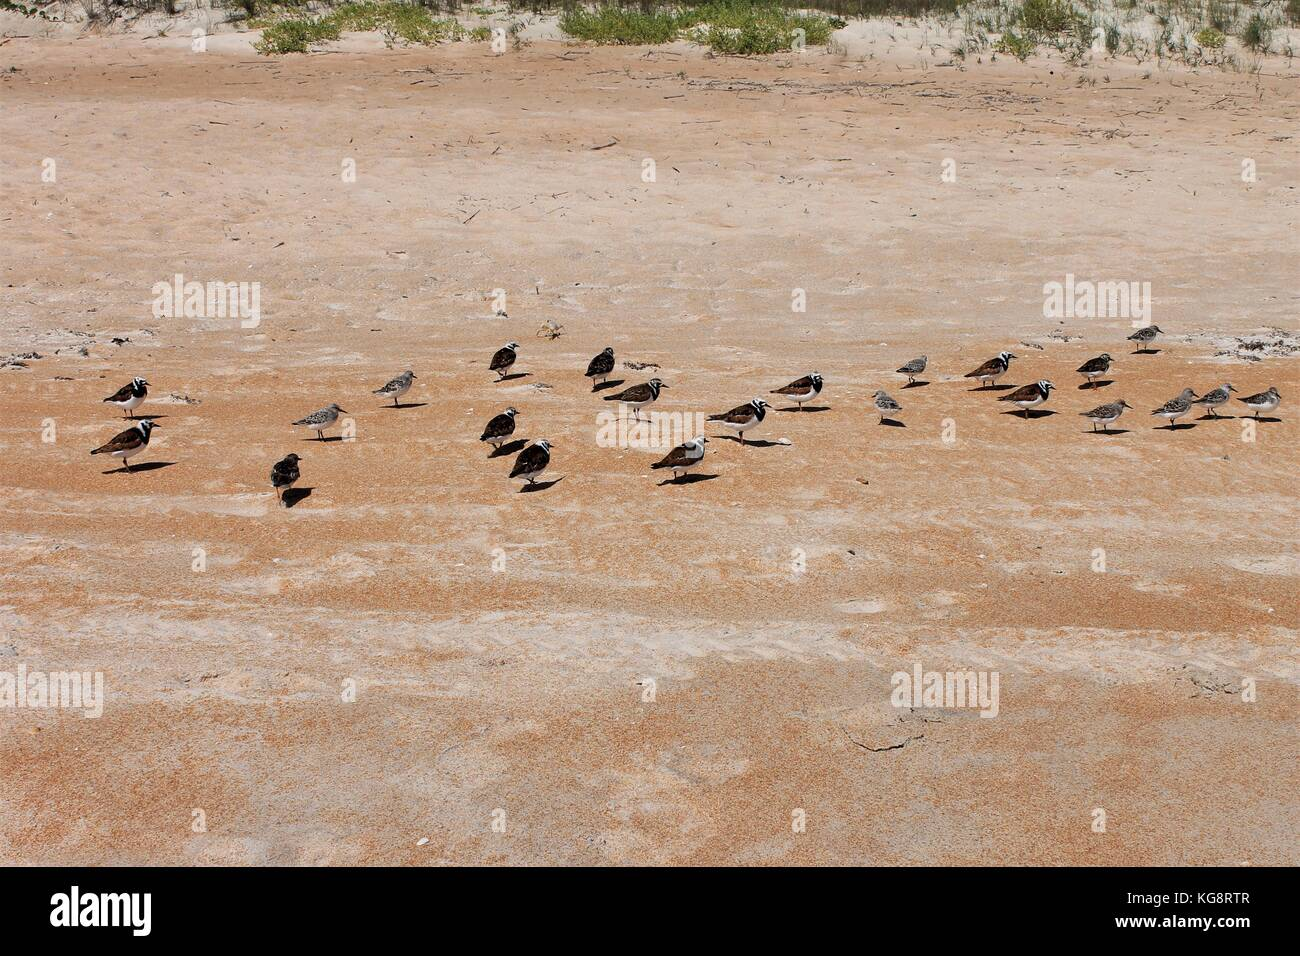 Sandpipers on the beach, Ormond Beach, Florida, USA - Stock Image